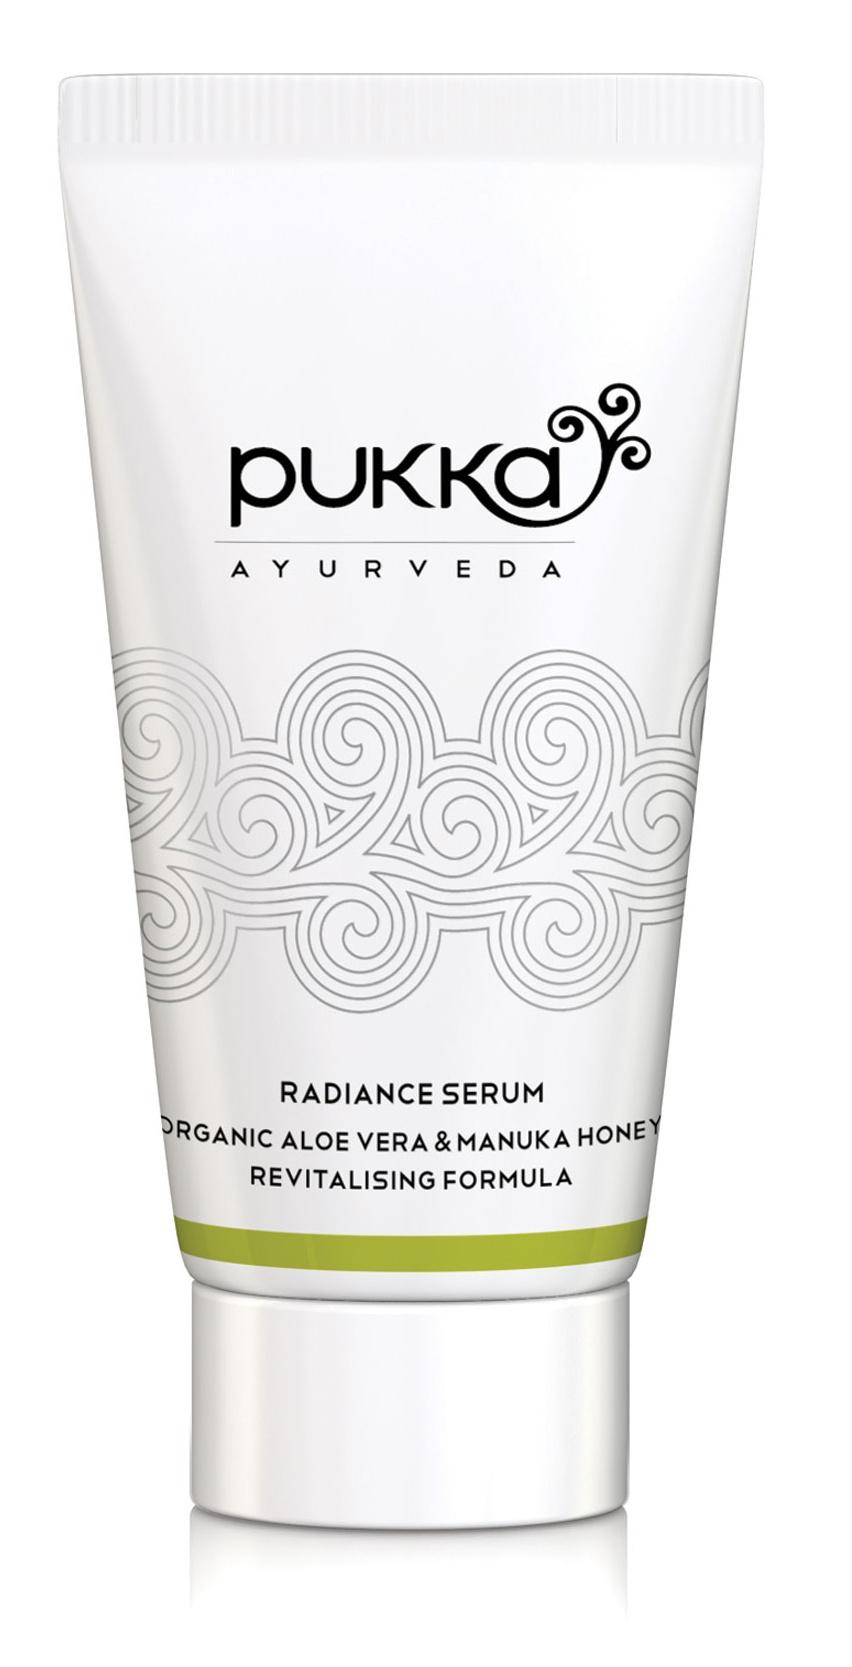 Pukka Radiance Serum